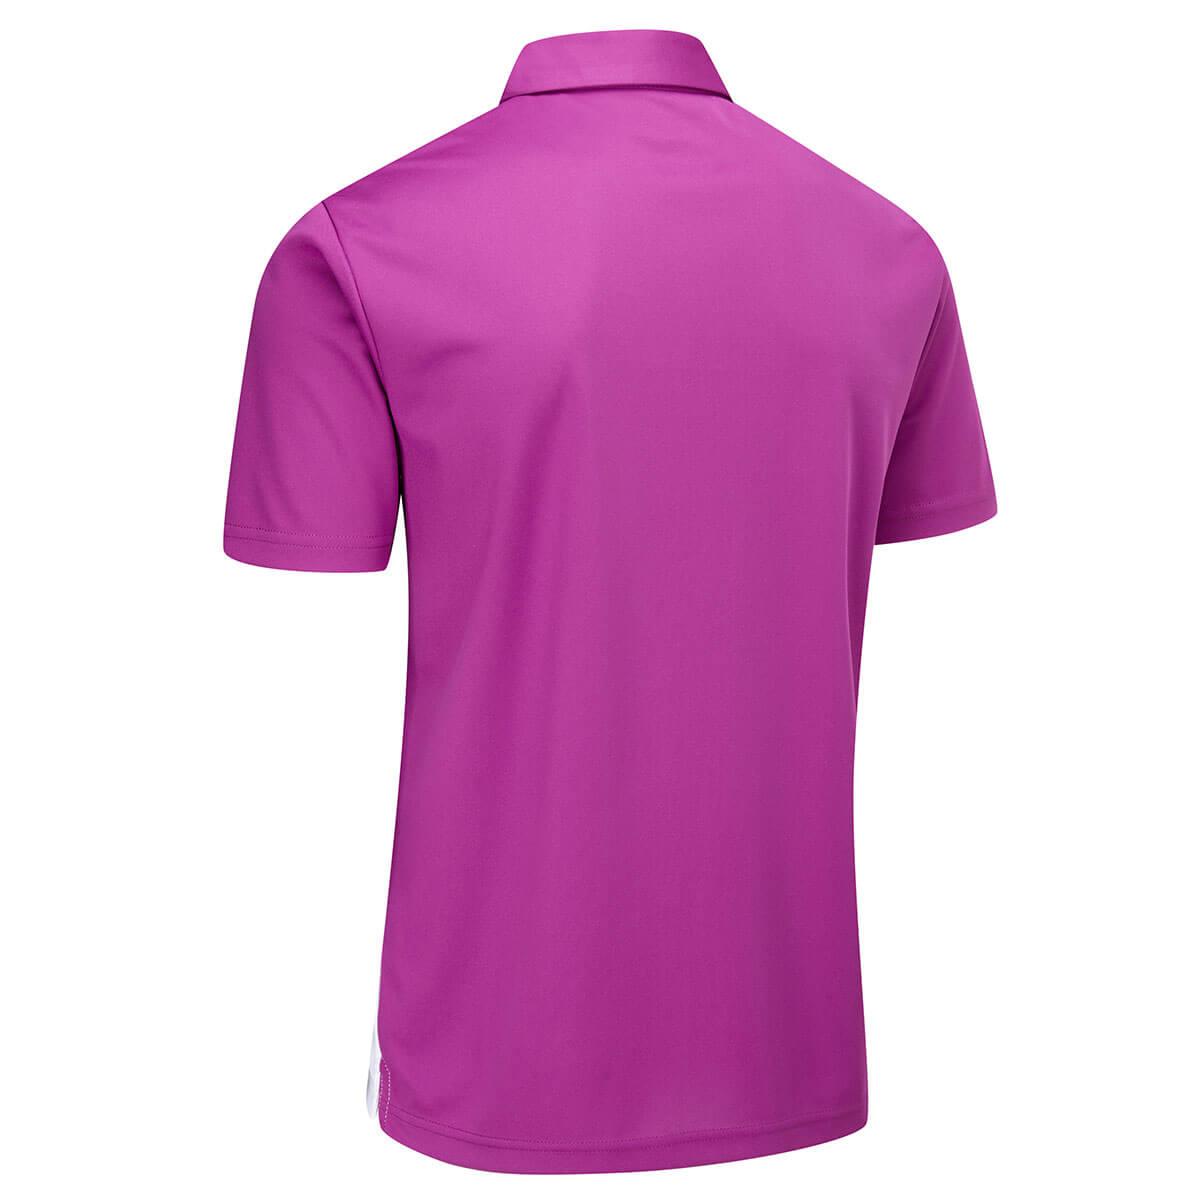 Stuburt-Mens-2019-Evolve-Dalton-Moisture-Wicking-Lightweight-Golf-Polo-Shirt Indexbild 5